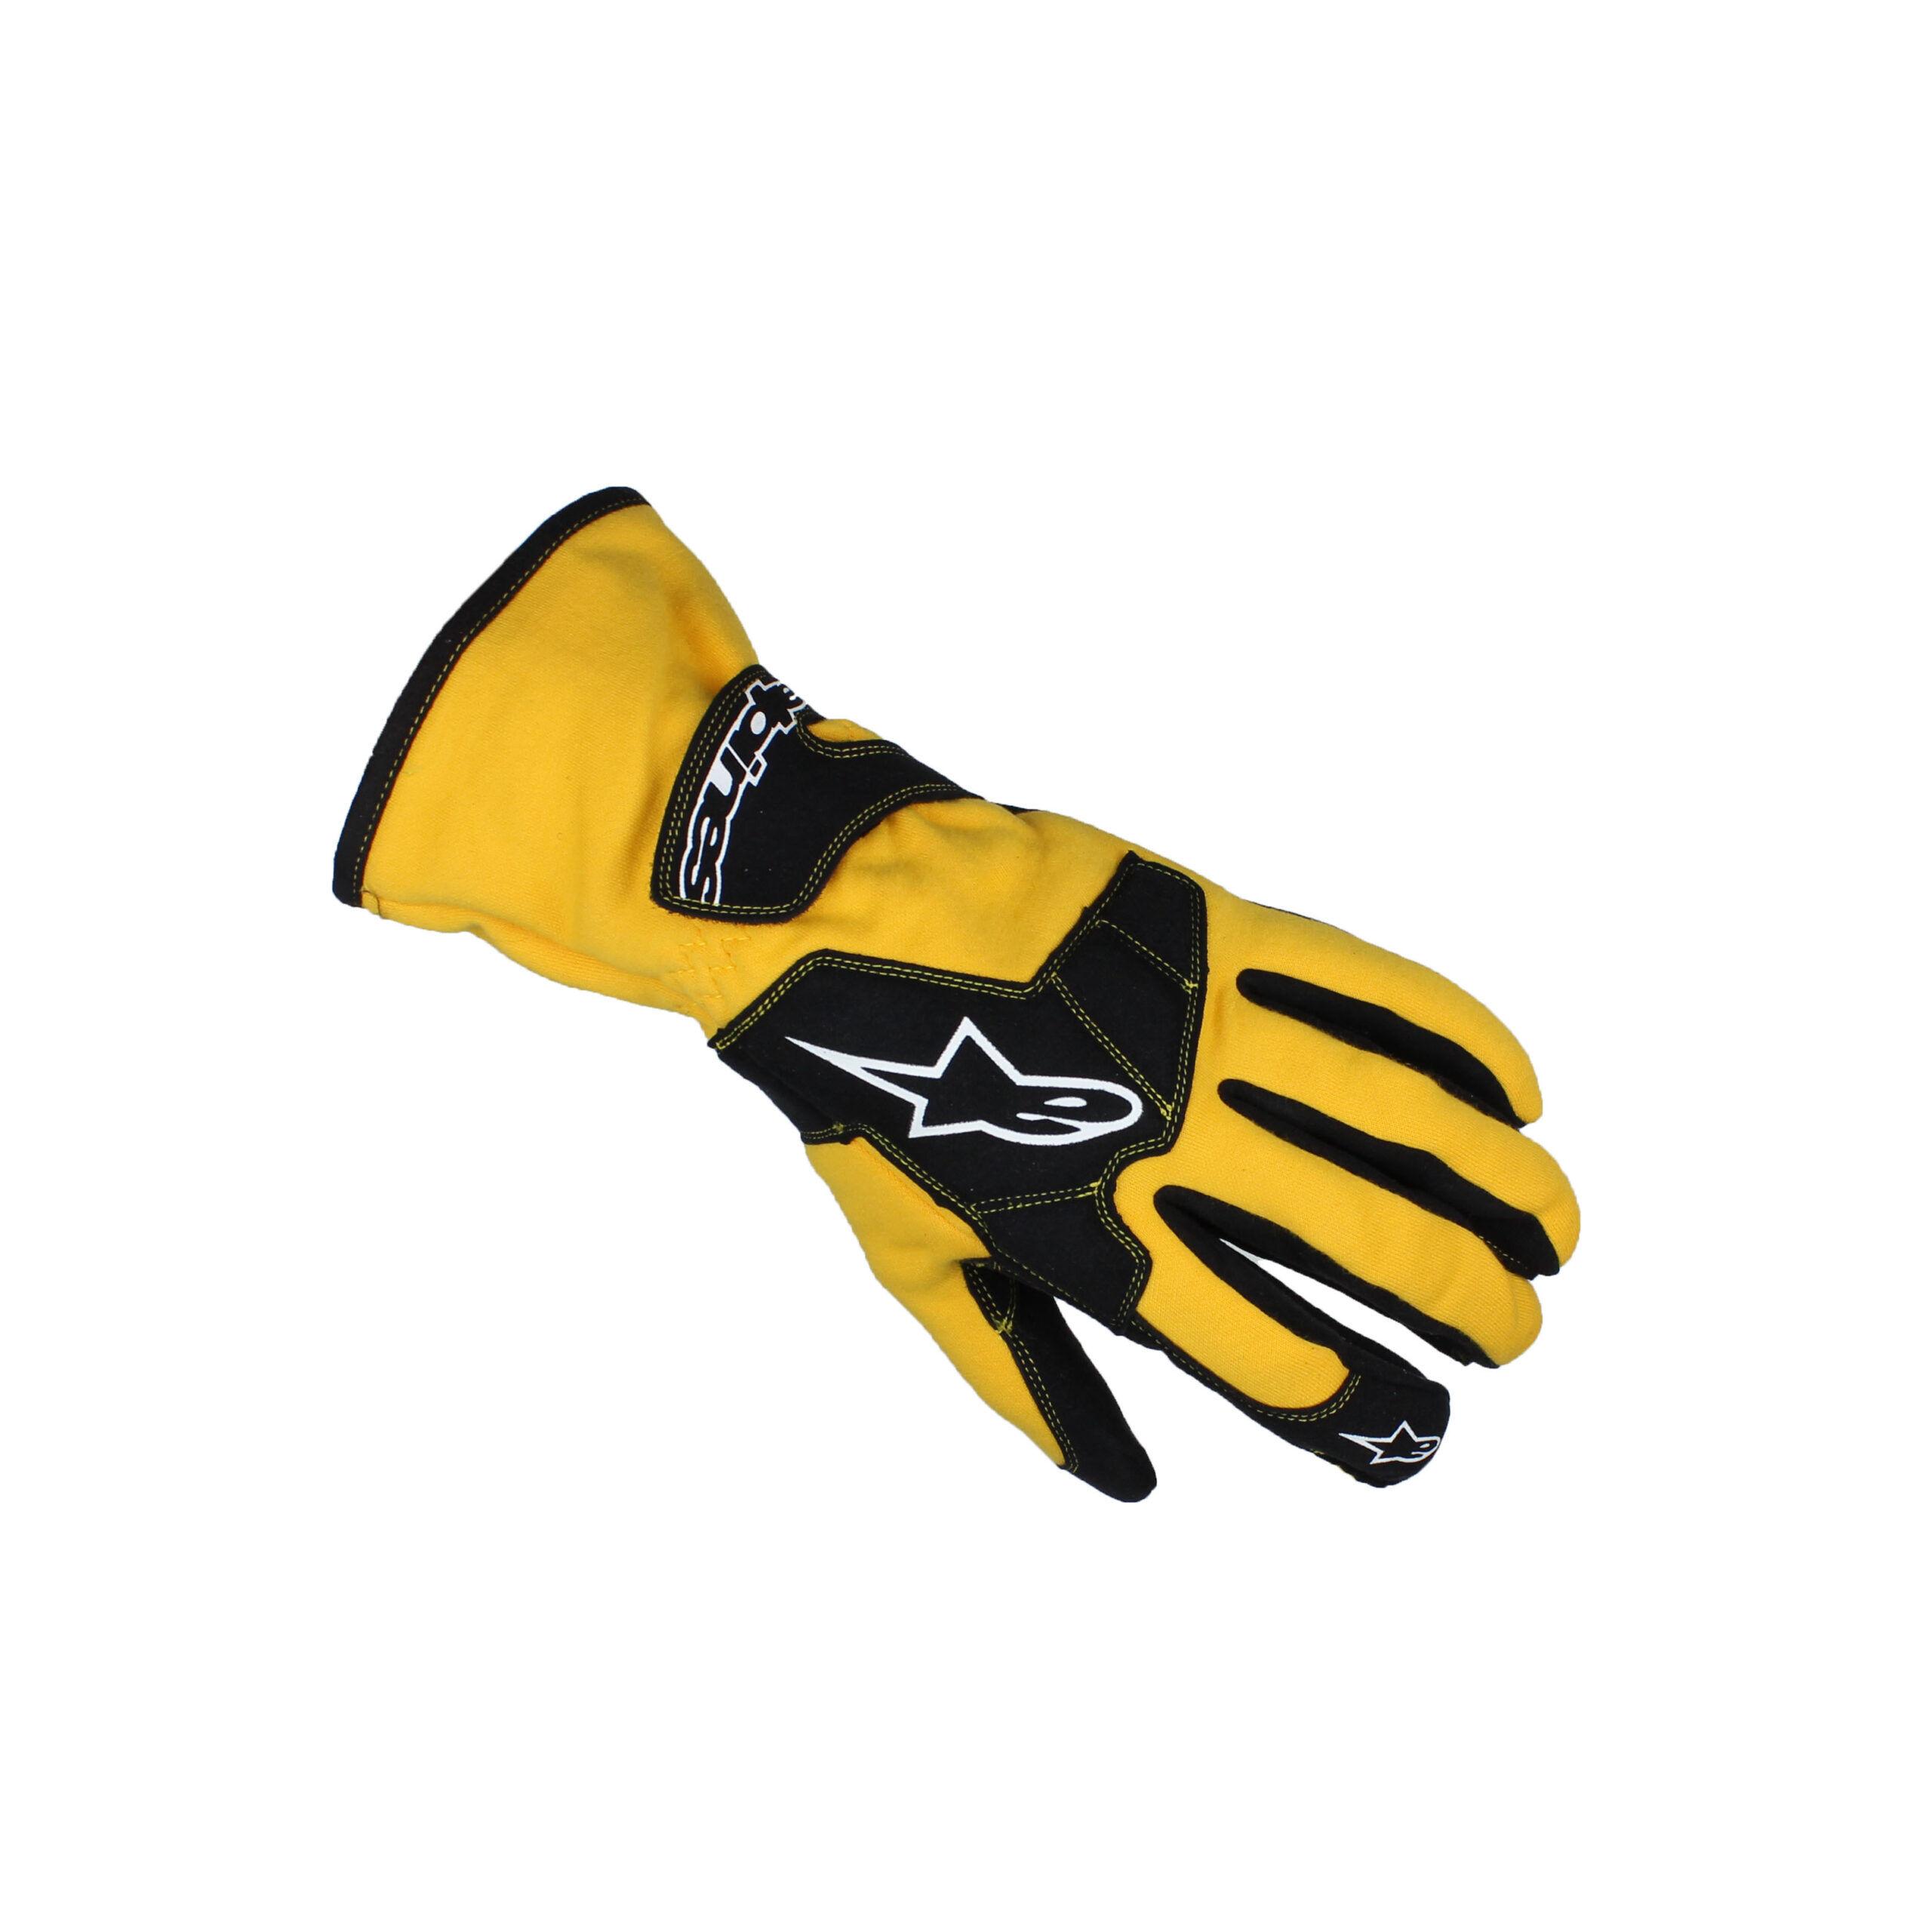 Alpinestars TECH 1-K Karting Gloves Yellow/Black